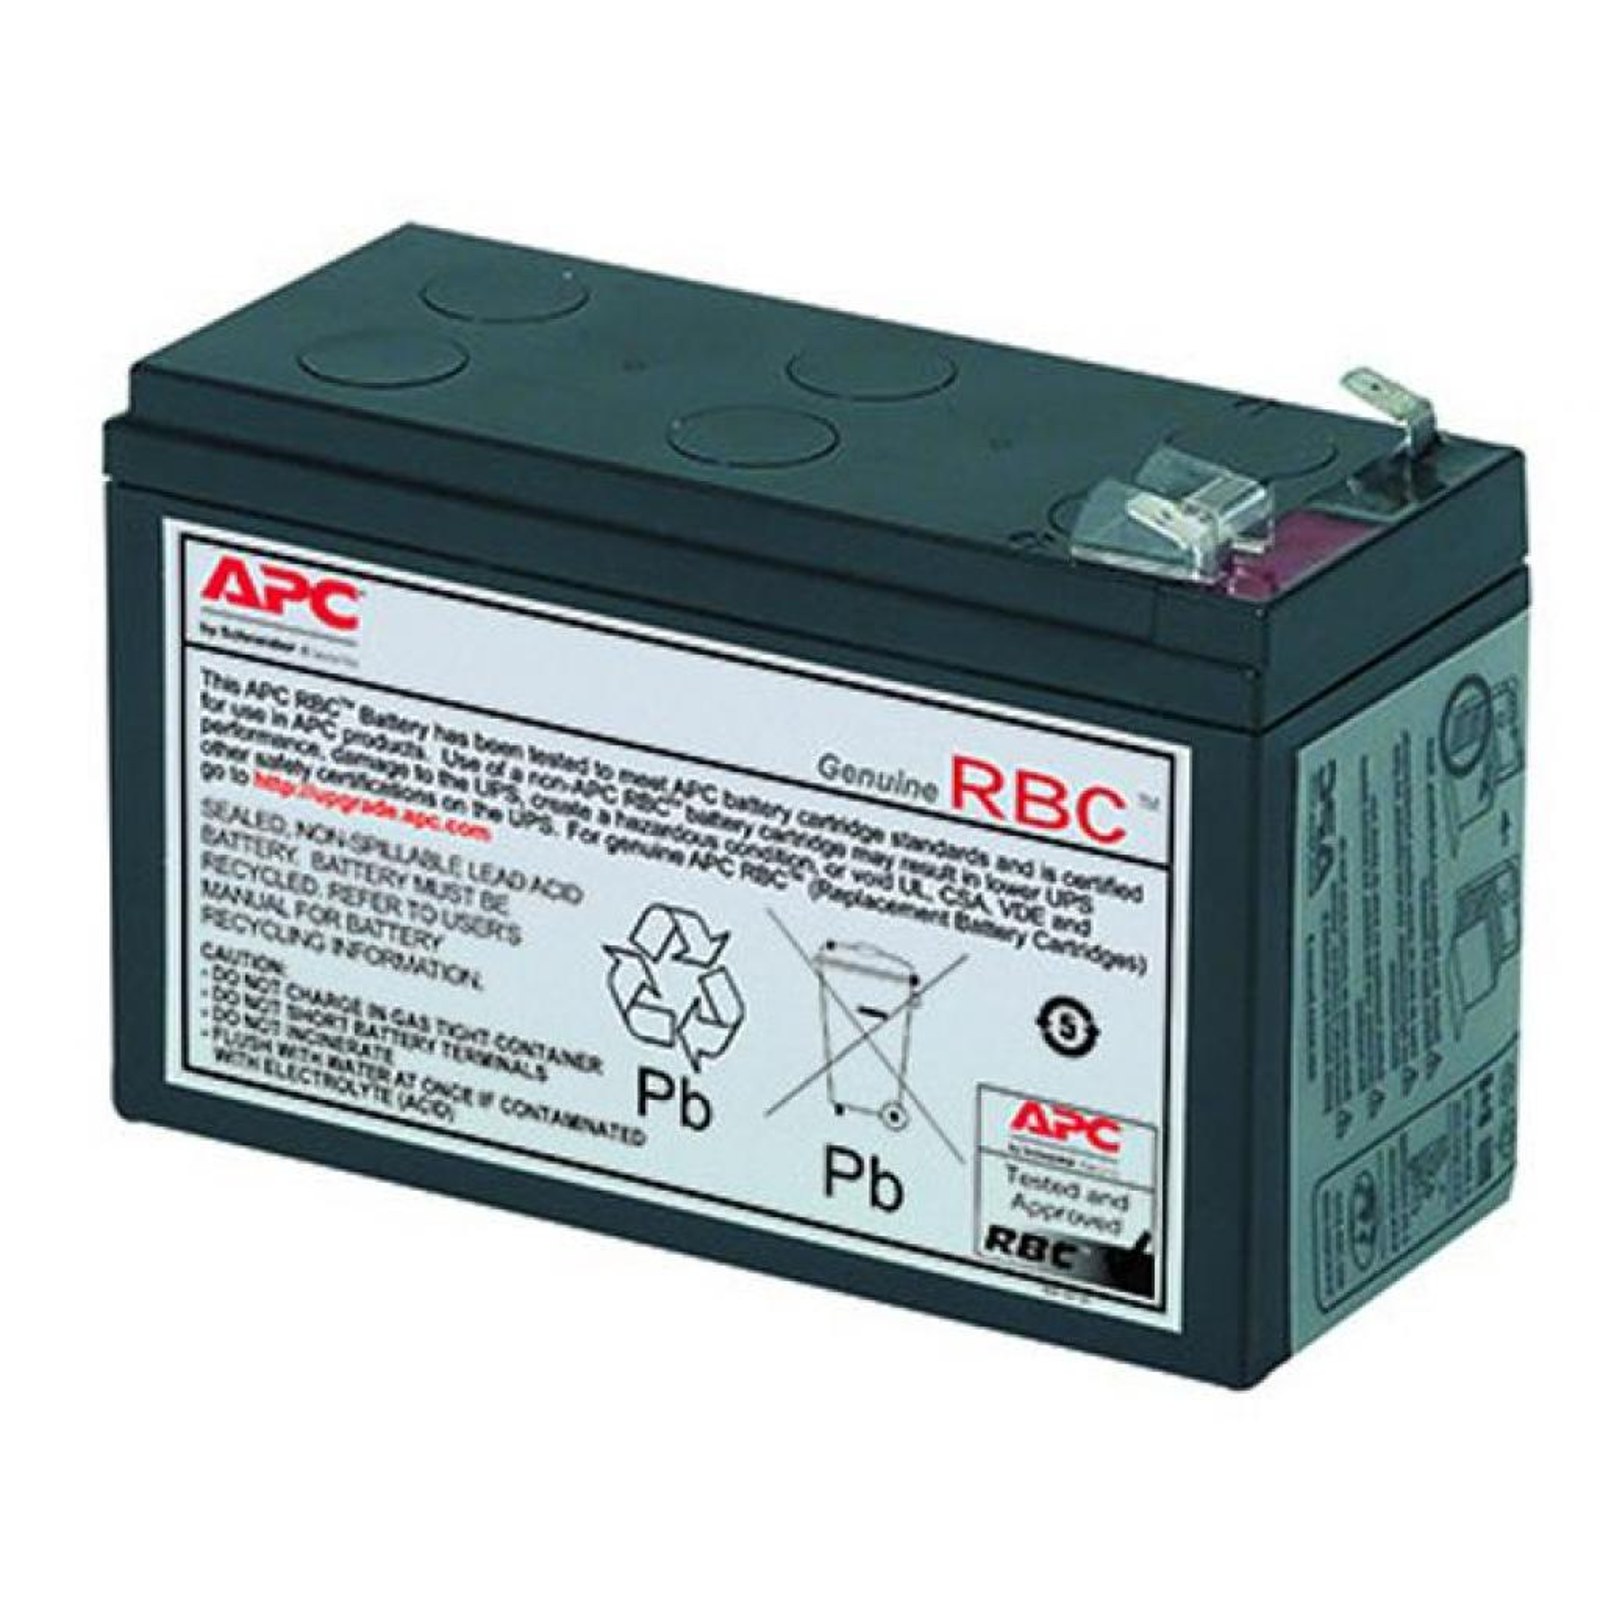 Батарея к ИБП APC Replacement Battery Cartridge #106 (APCRBC106)